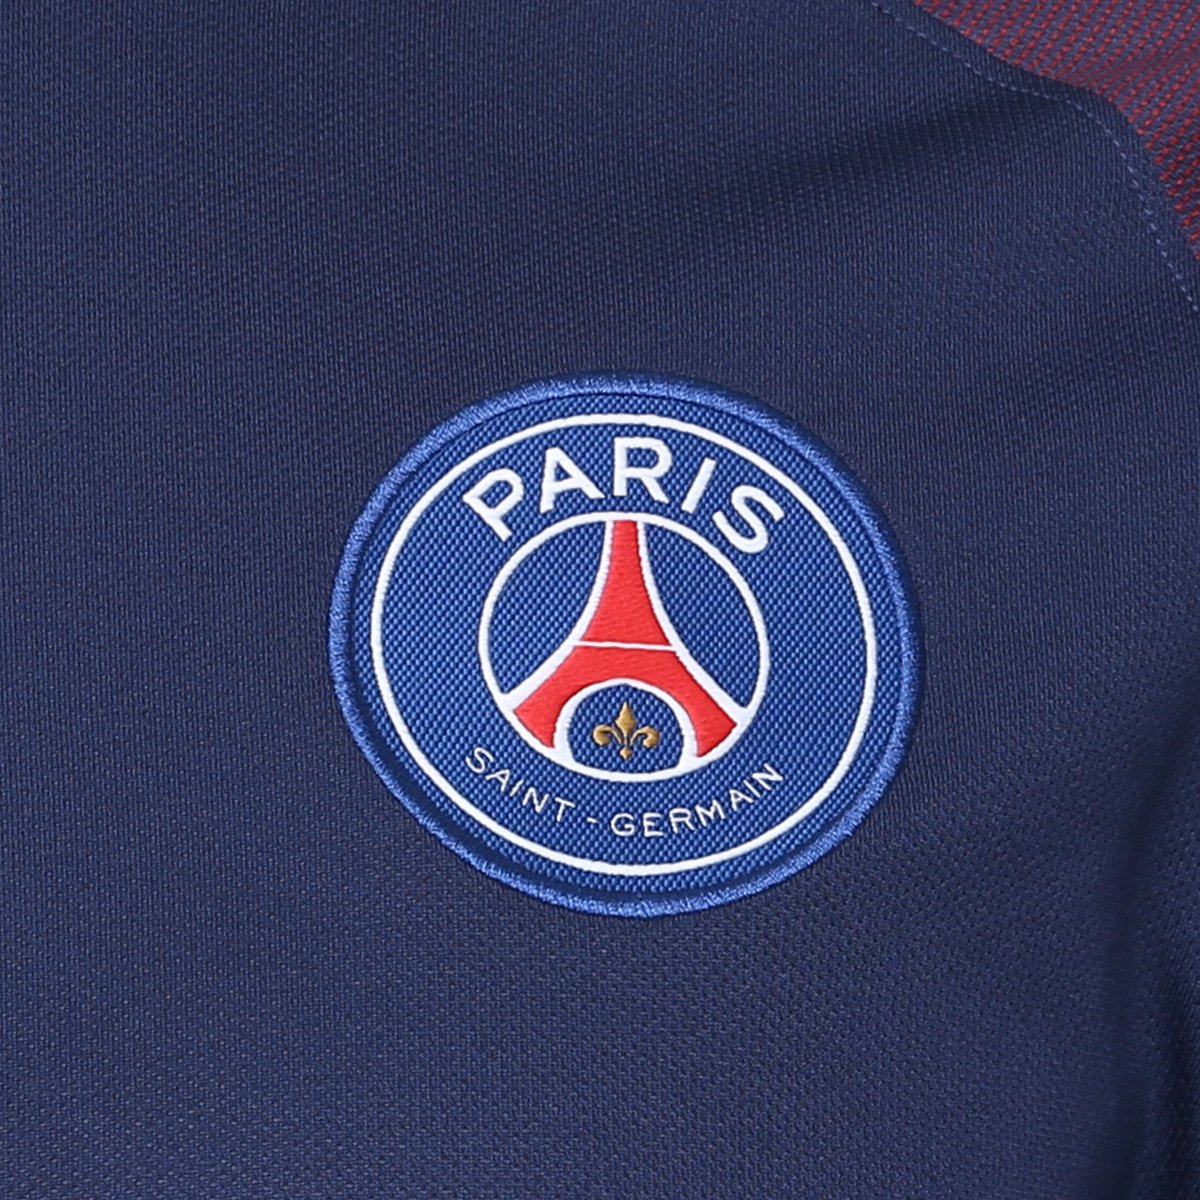 ... Camisa Paris Saint Germain Home 17 18 n° 10 Neymar Jr Torcedor Nike  Masculina ... 46d5743fe91e1